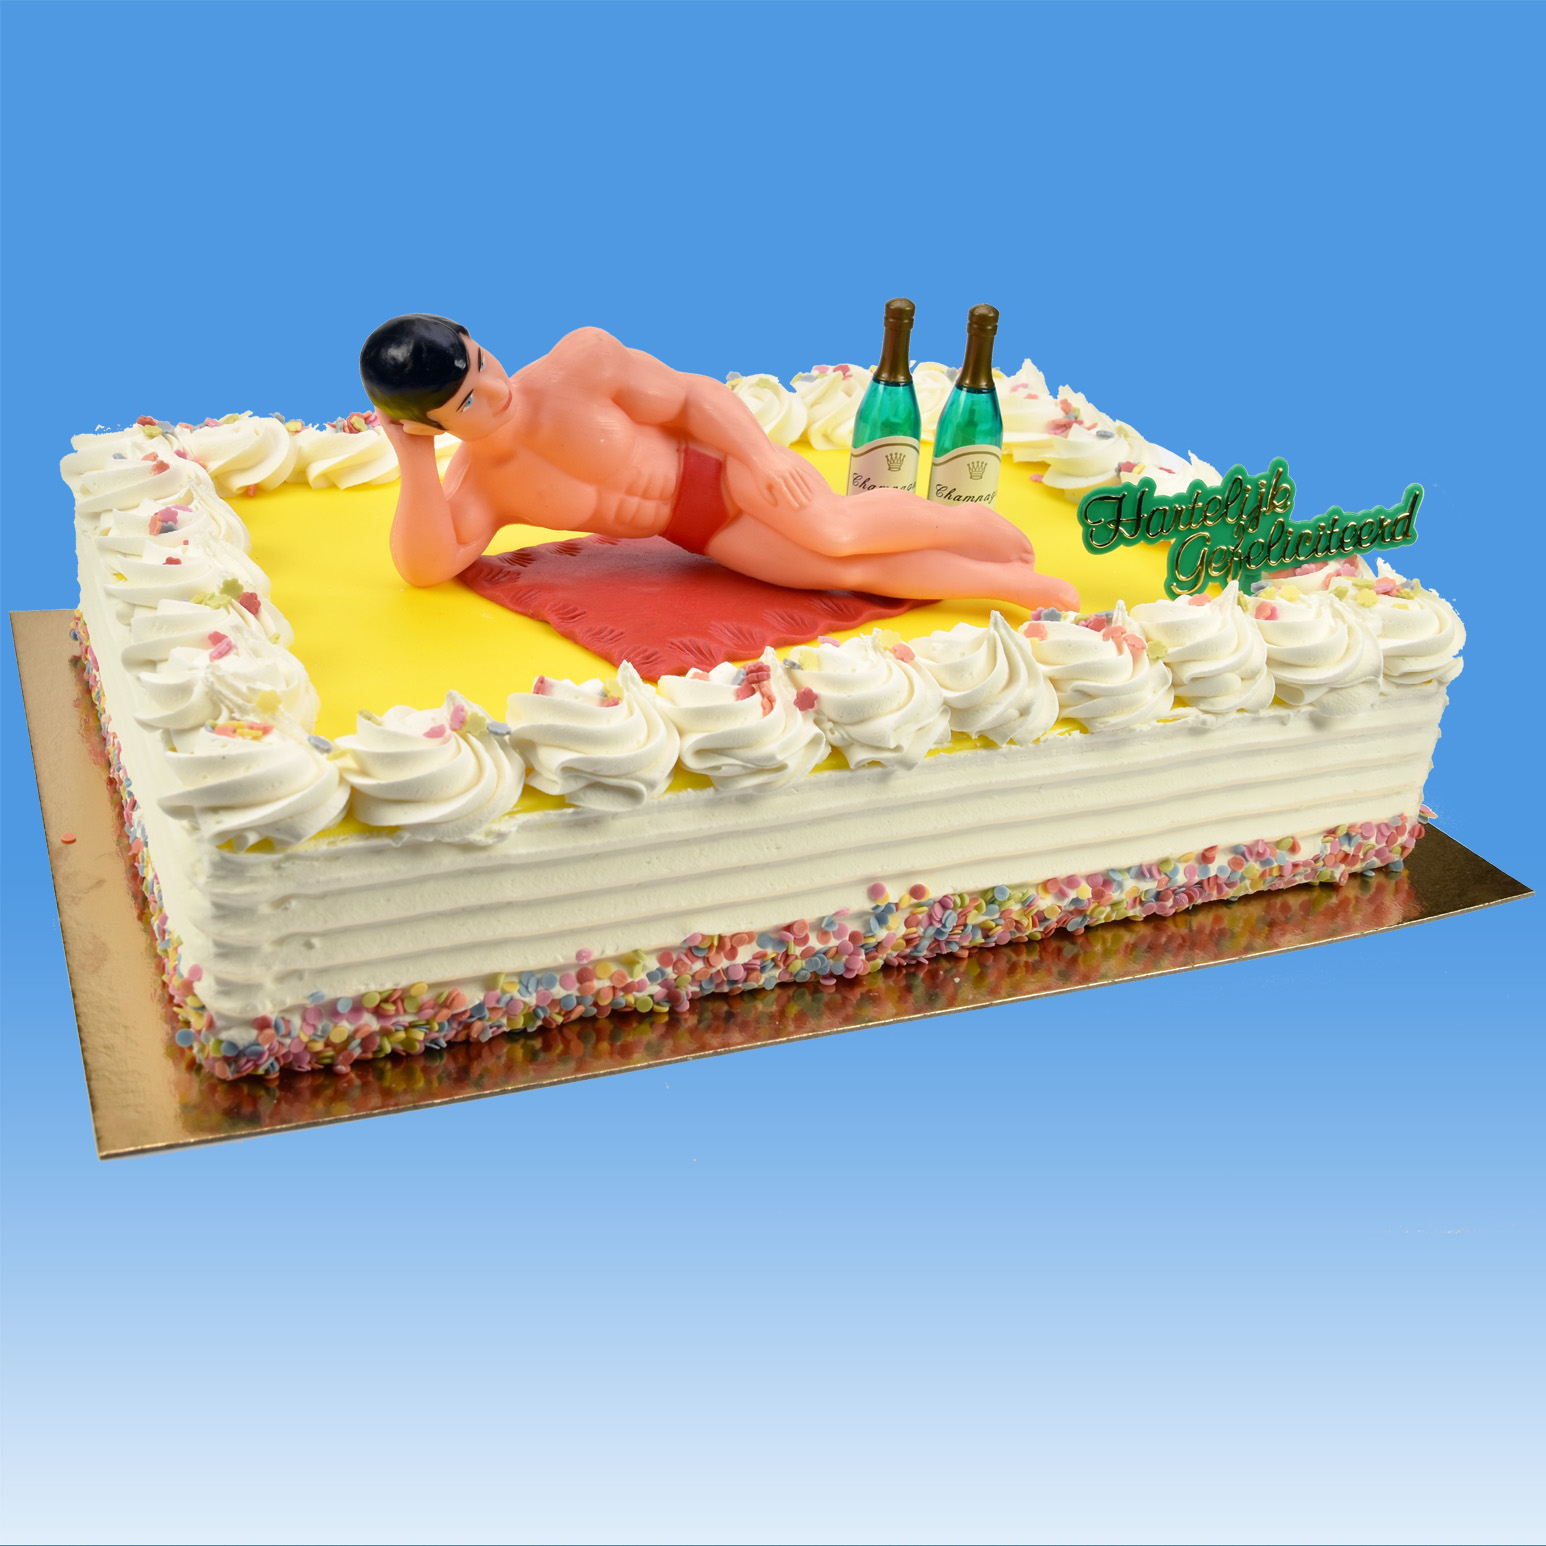 Stupendous Taartsetje Macho Man Online Bestellen Trend Decor Funny Birthday Cards Online Fluifree Goldxyz